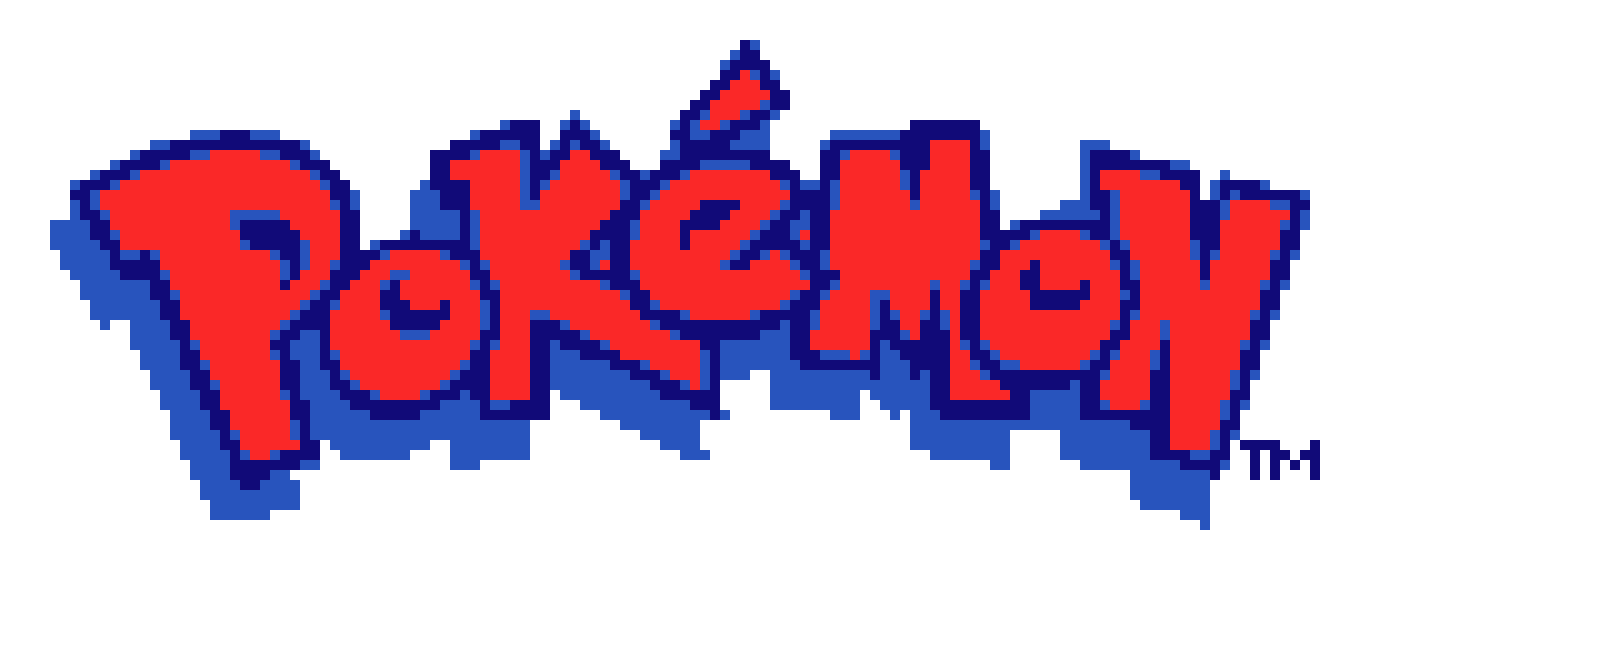 Pokemon Logo.